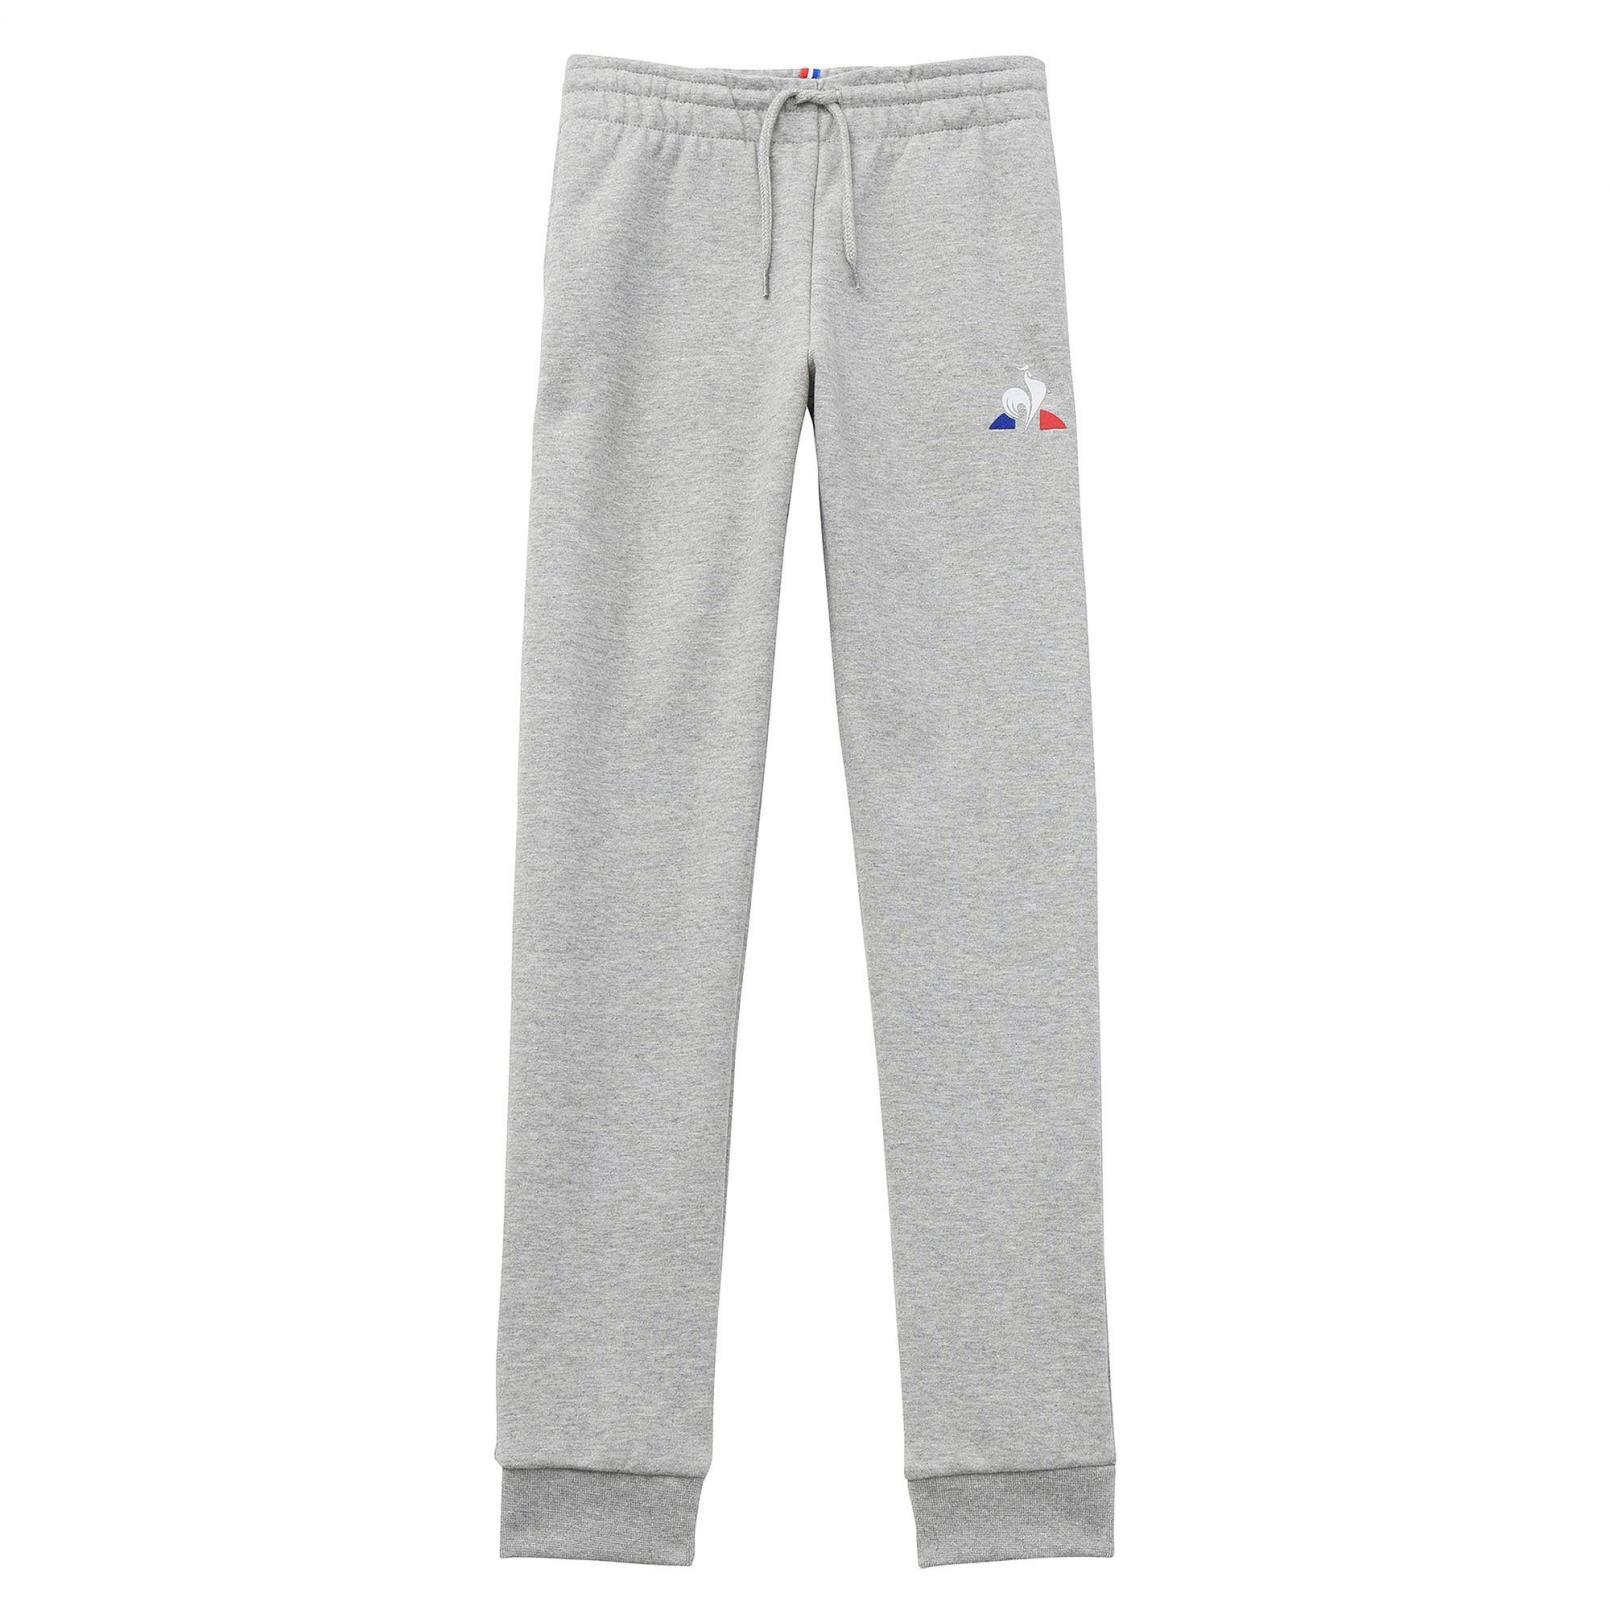 Kids Apparel – Le Coq Sportif Essentiels Pant Slim Grey